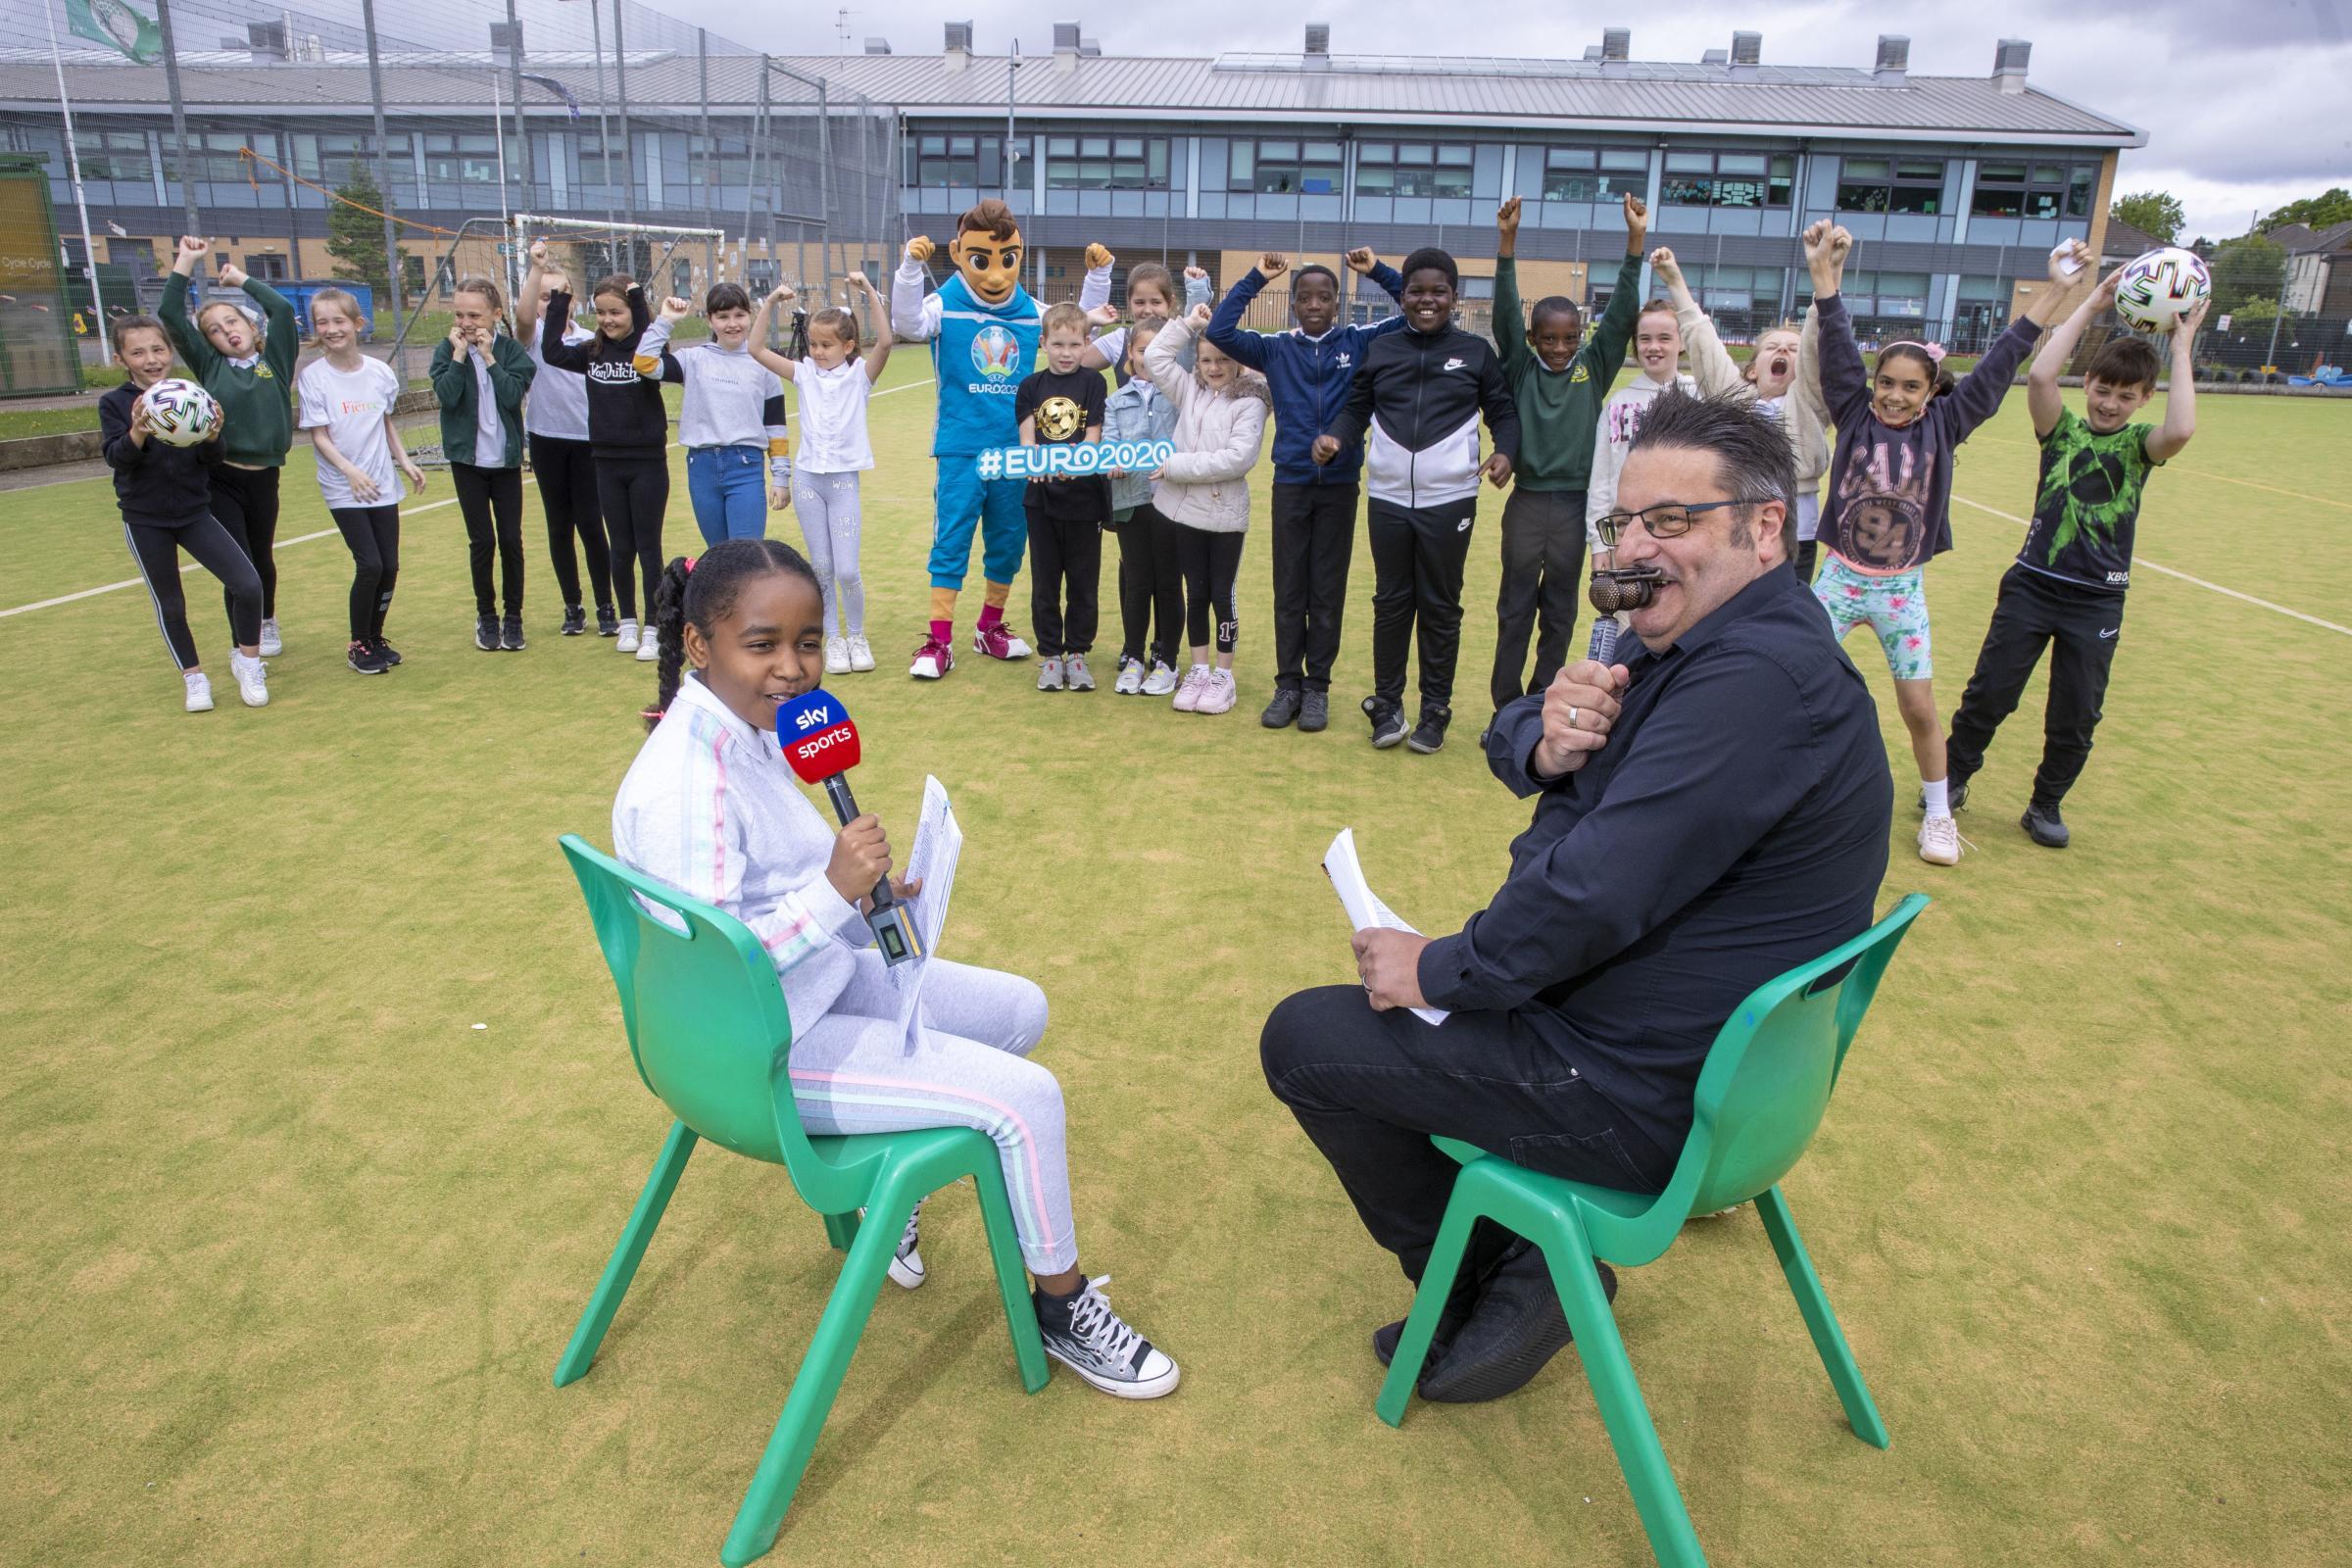 Scotland Euro 2020: School pupils get visit from Sky Sports star Ian Crocker